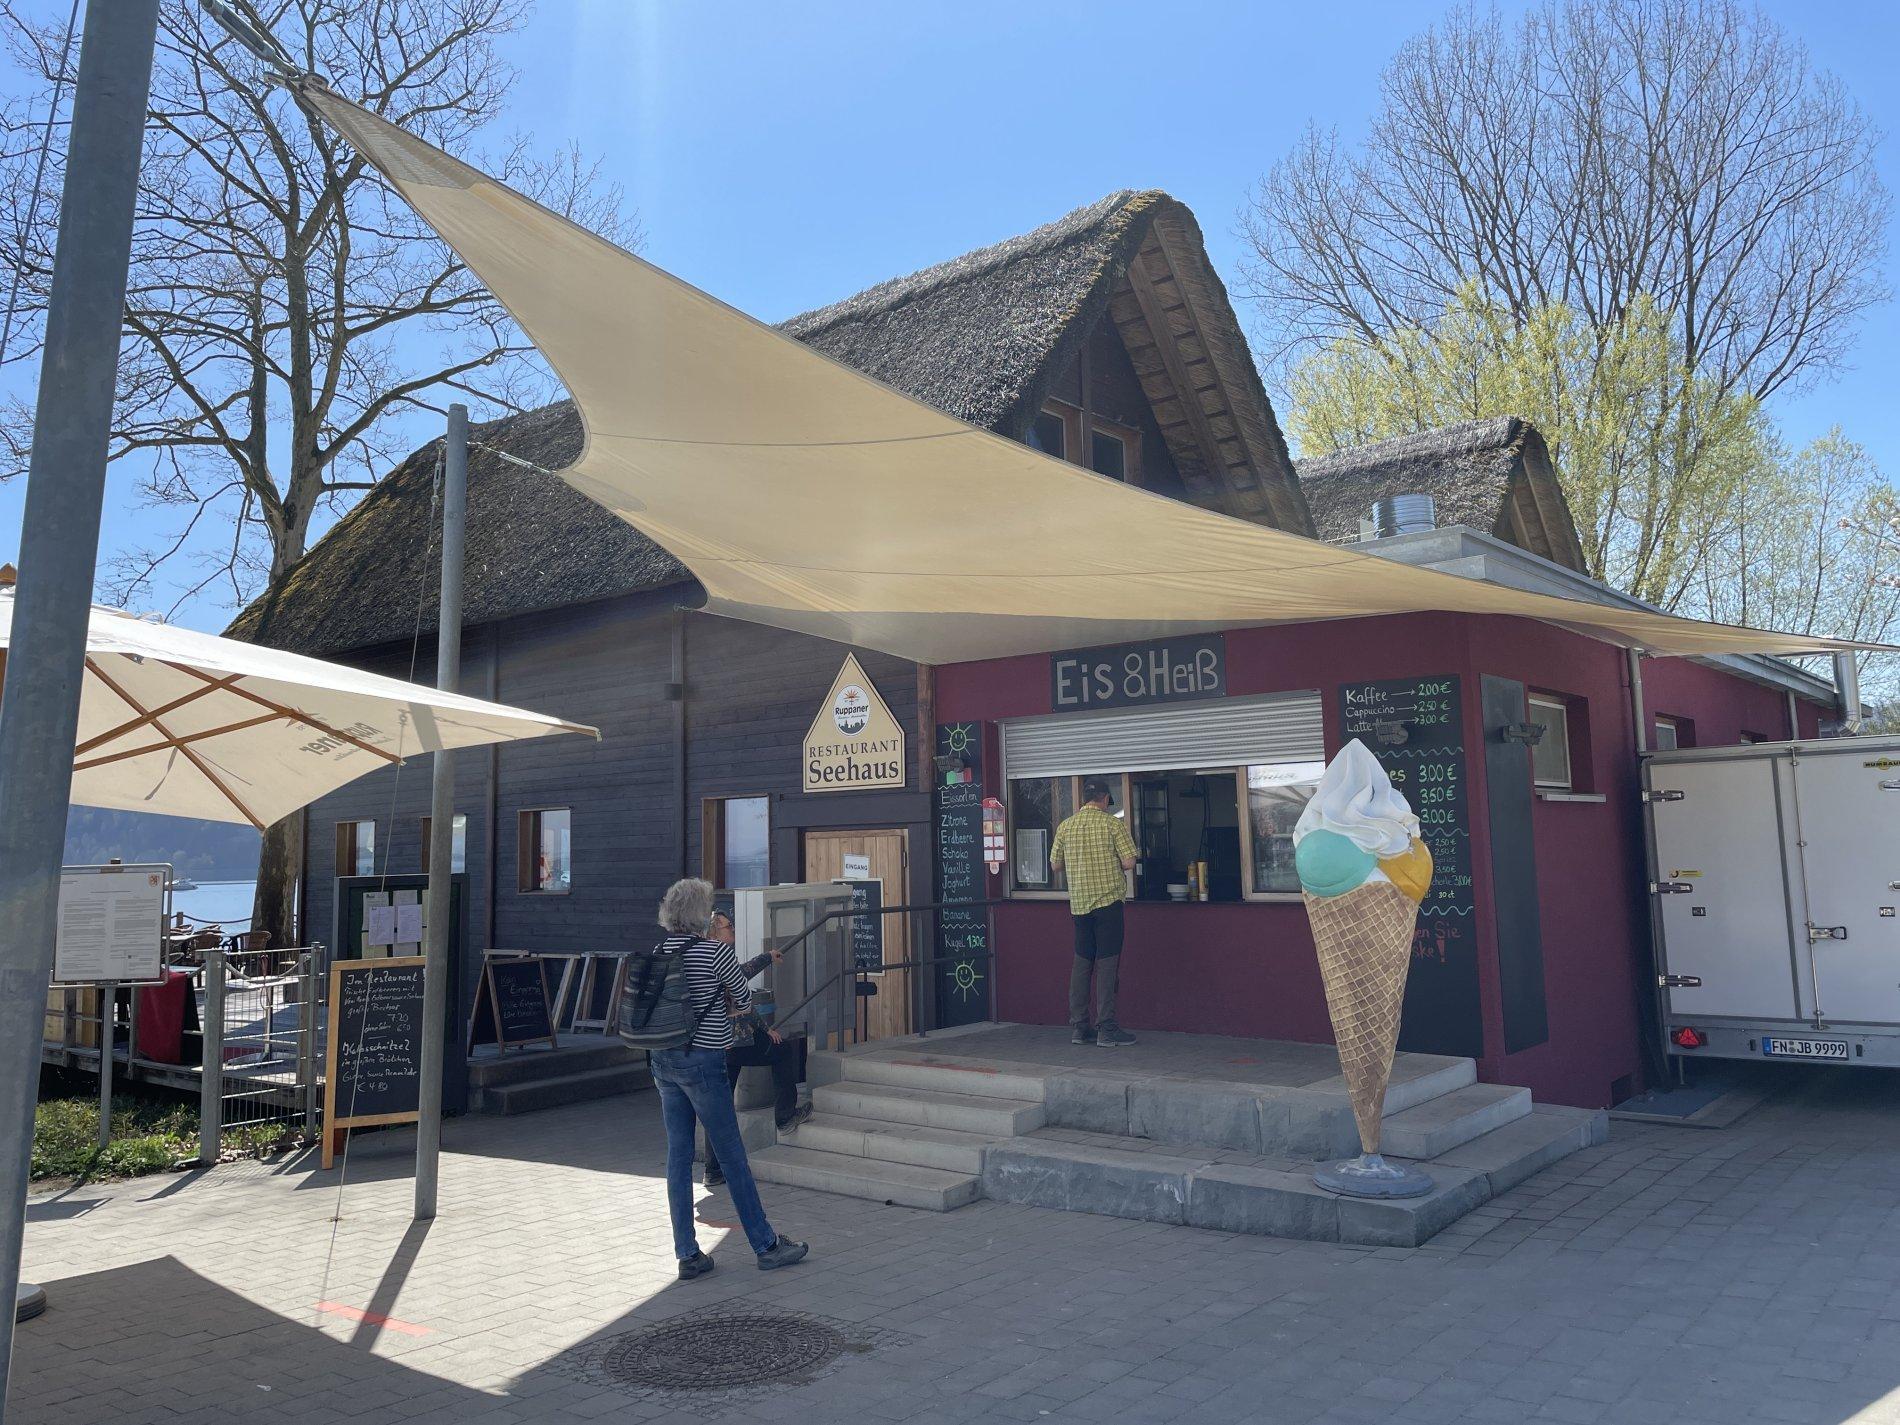 Kiosk am Restaurant Seehaus